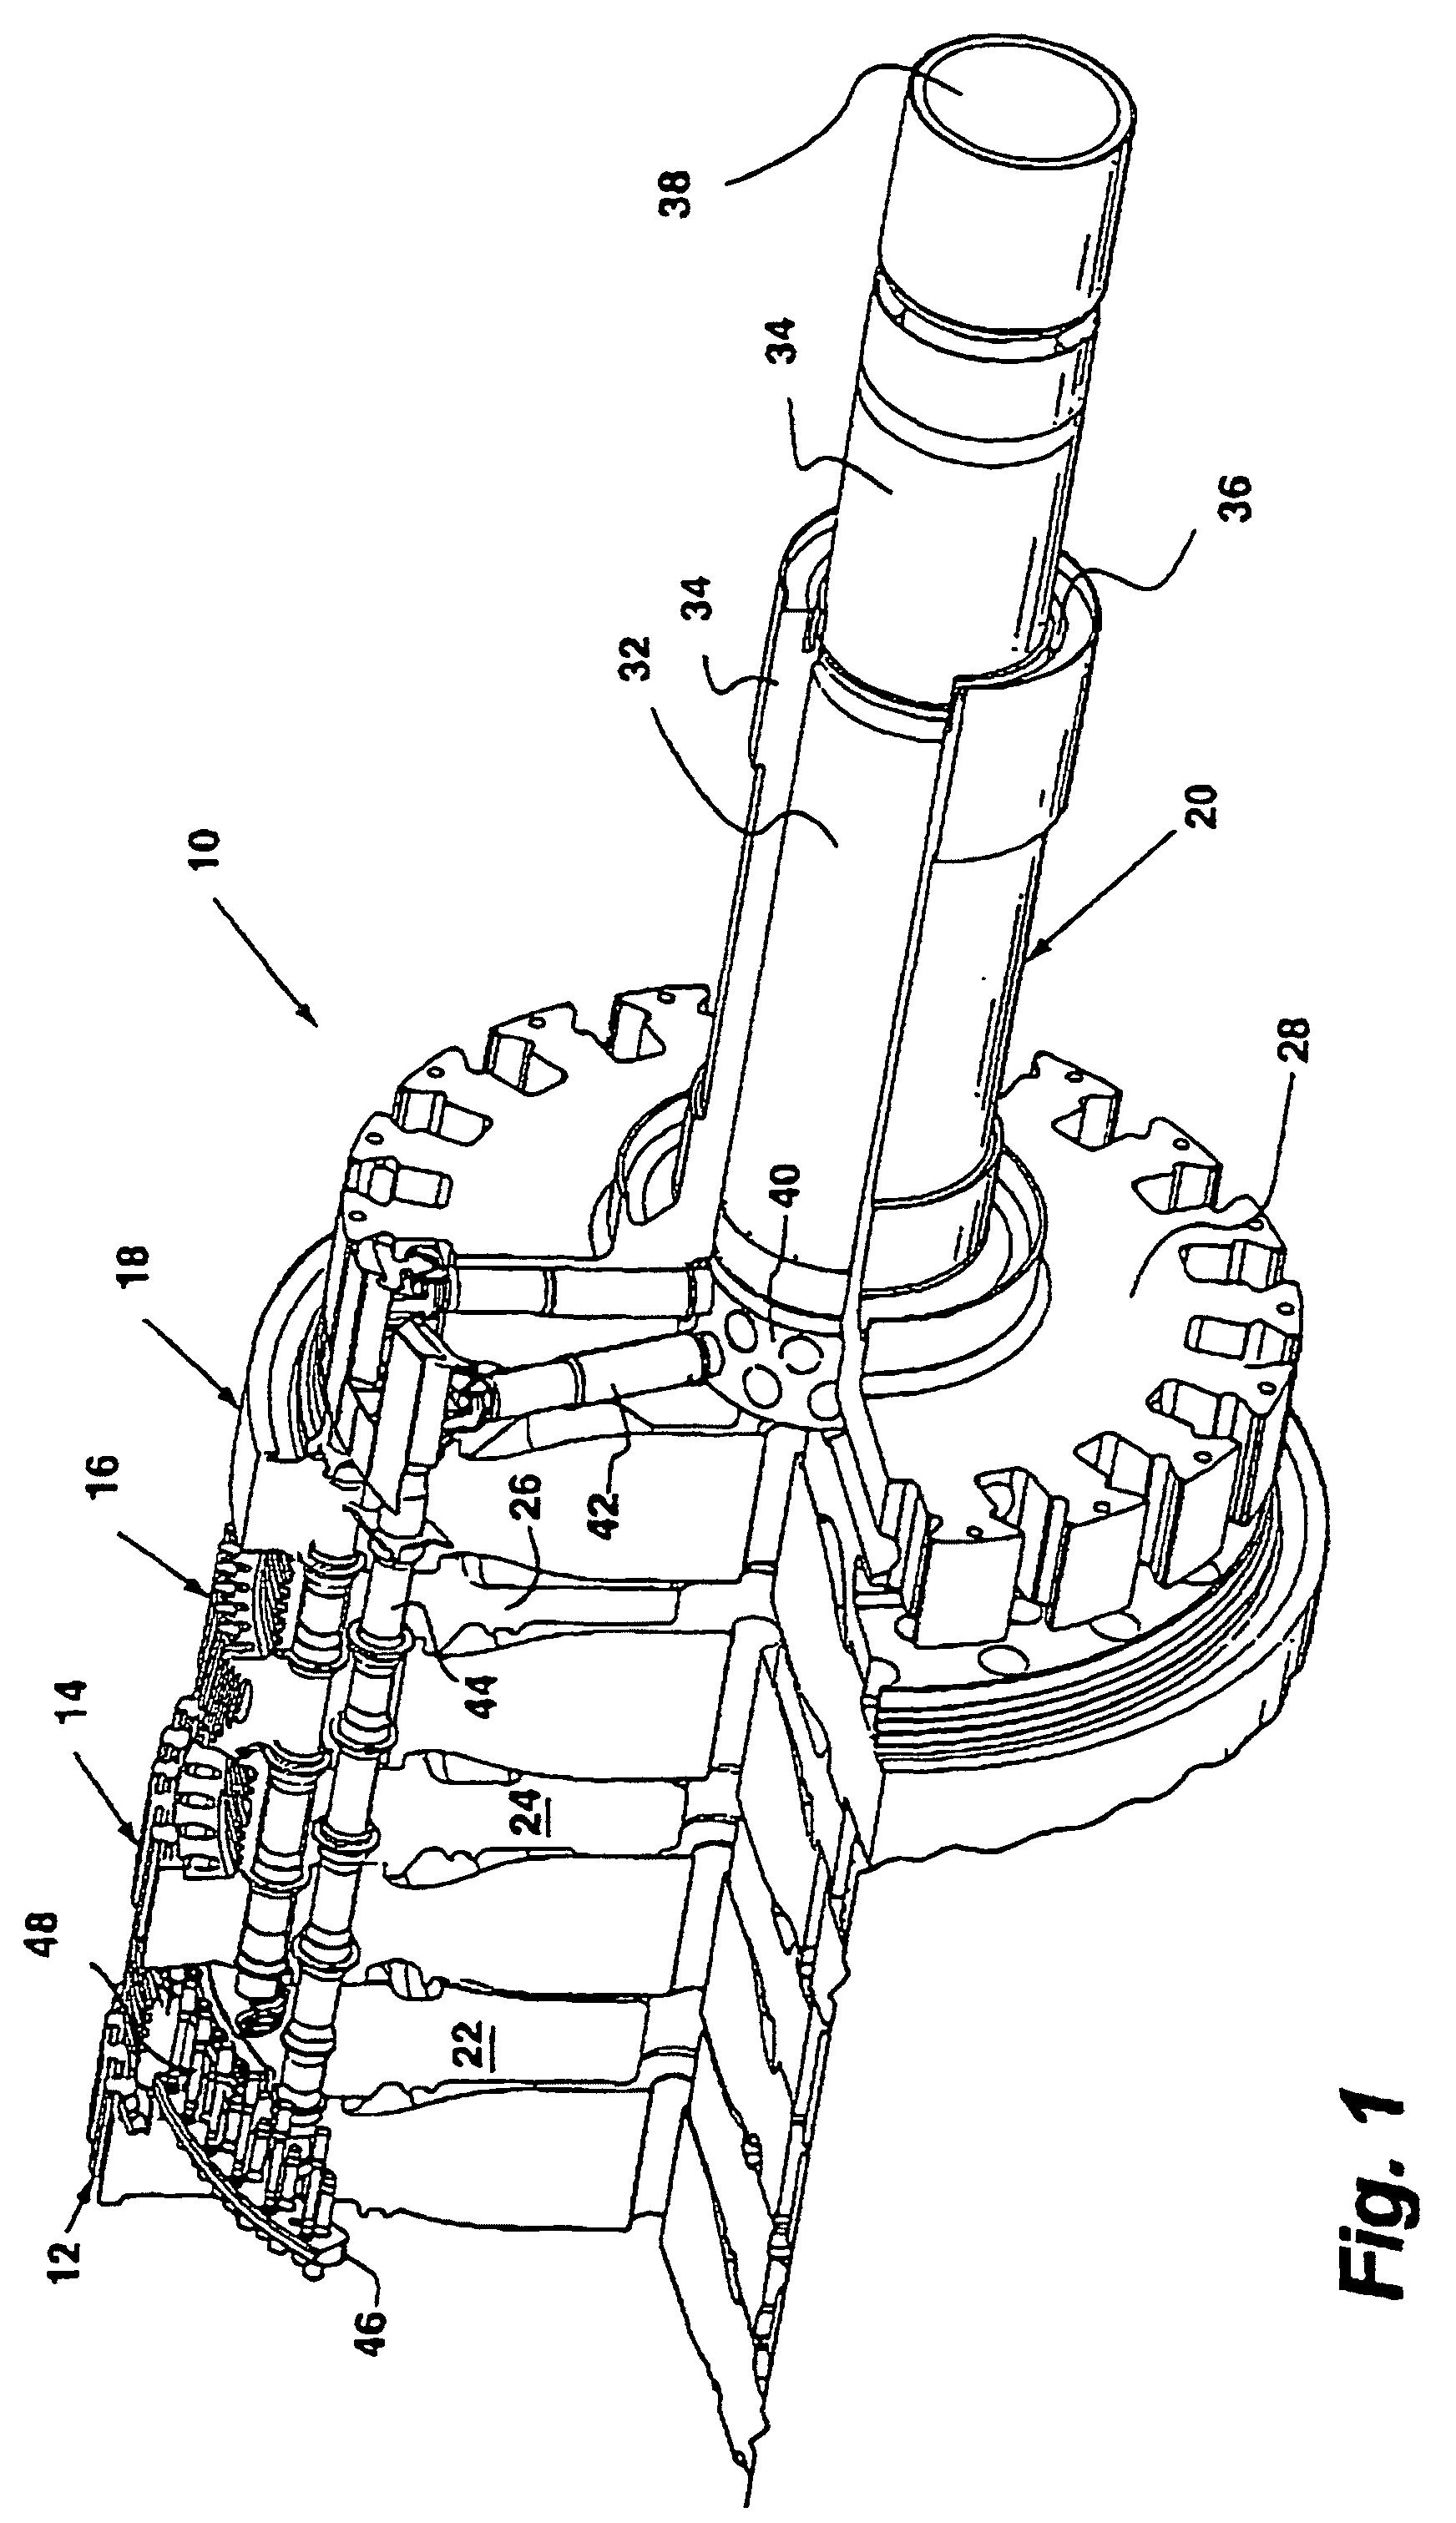 Patente EP B1 Debris trap in a turbine cooling system